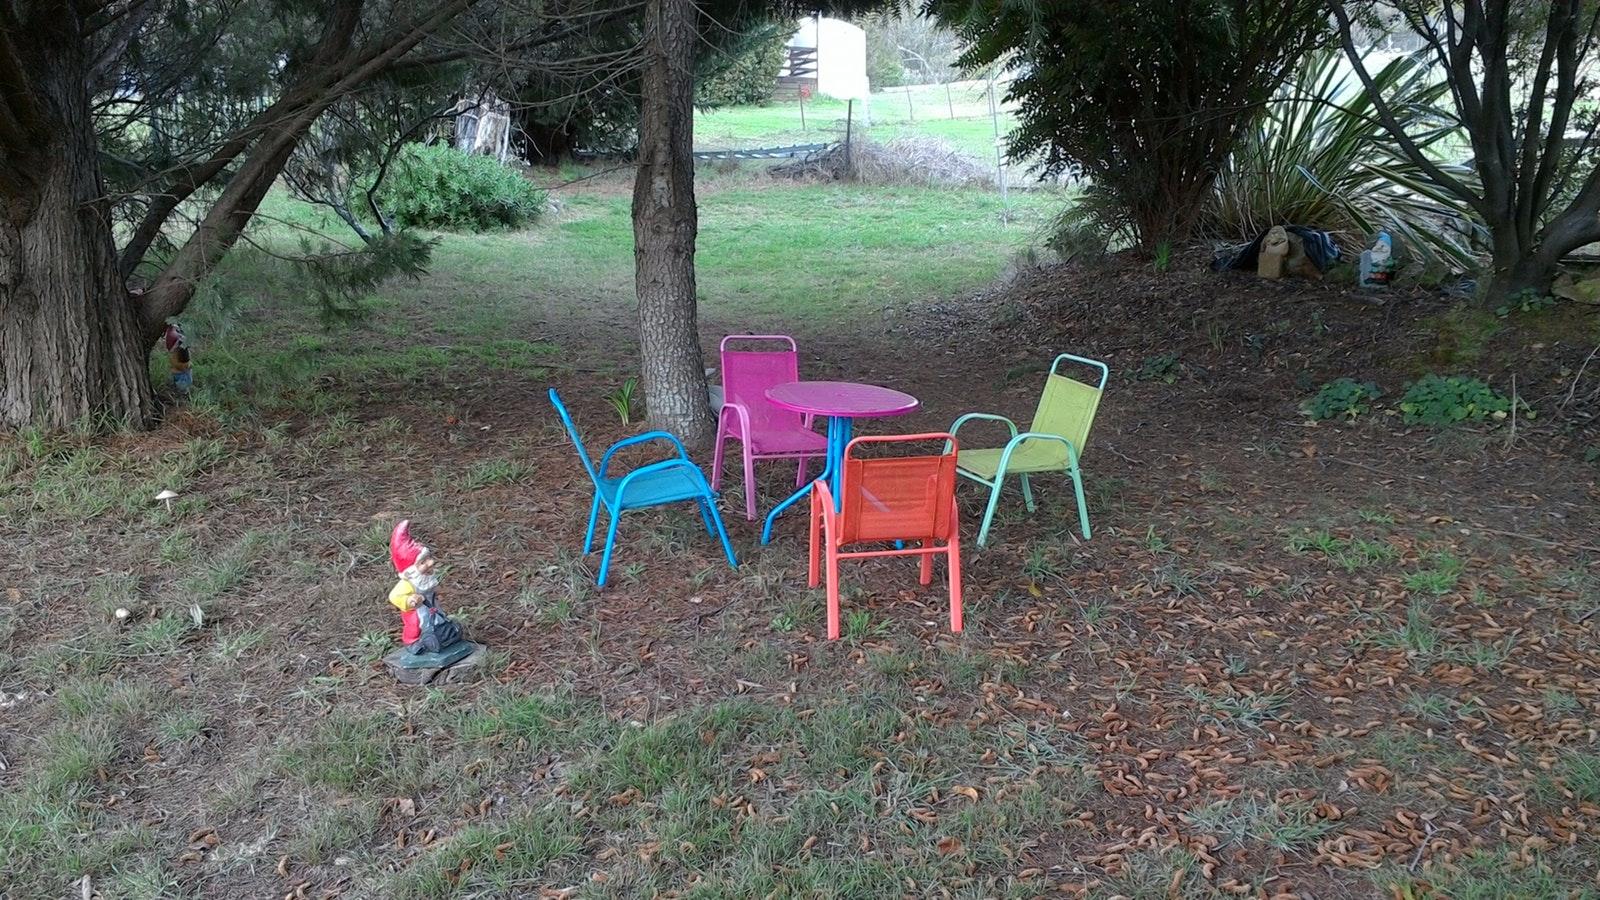 Fairy and gnome garden